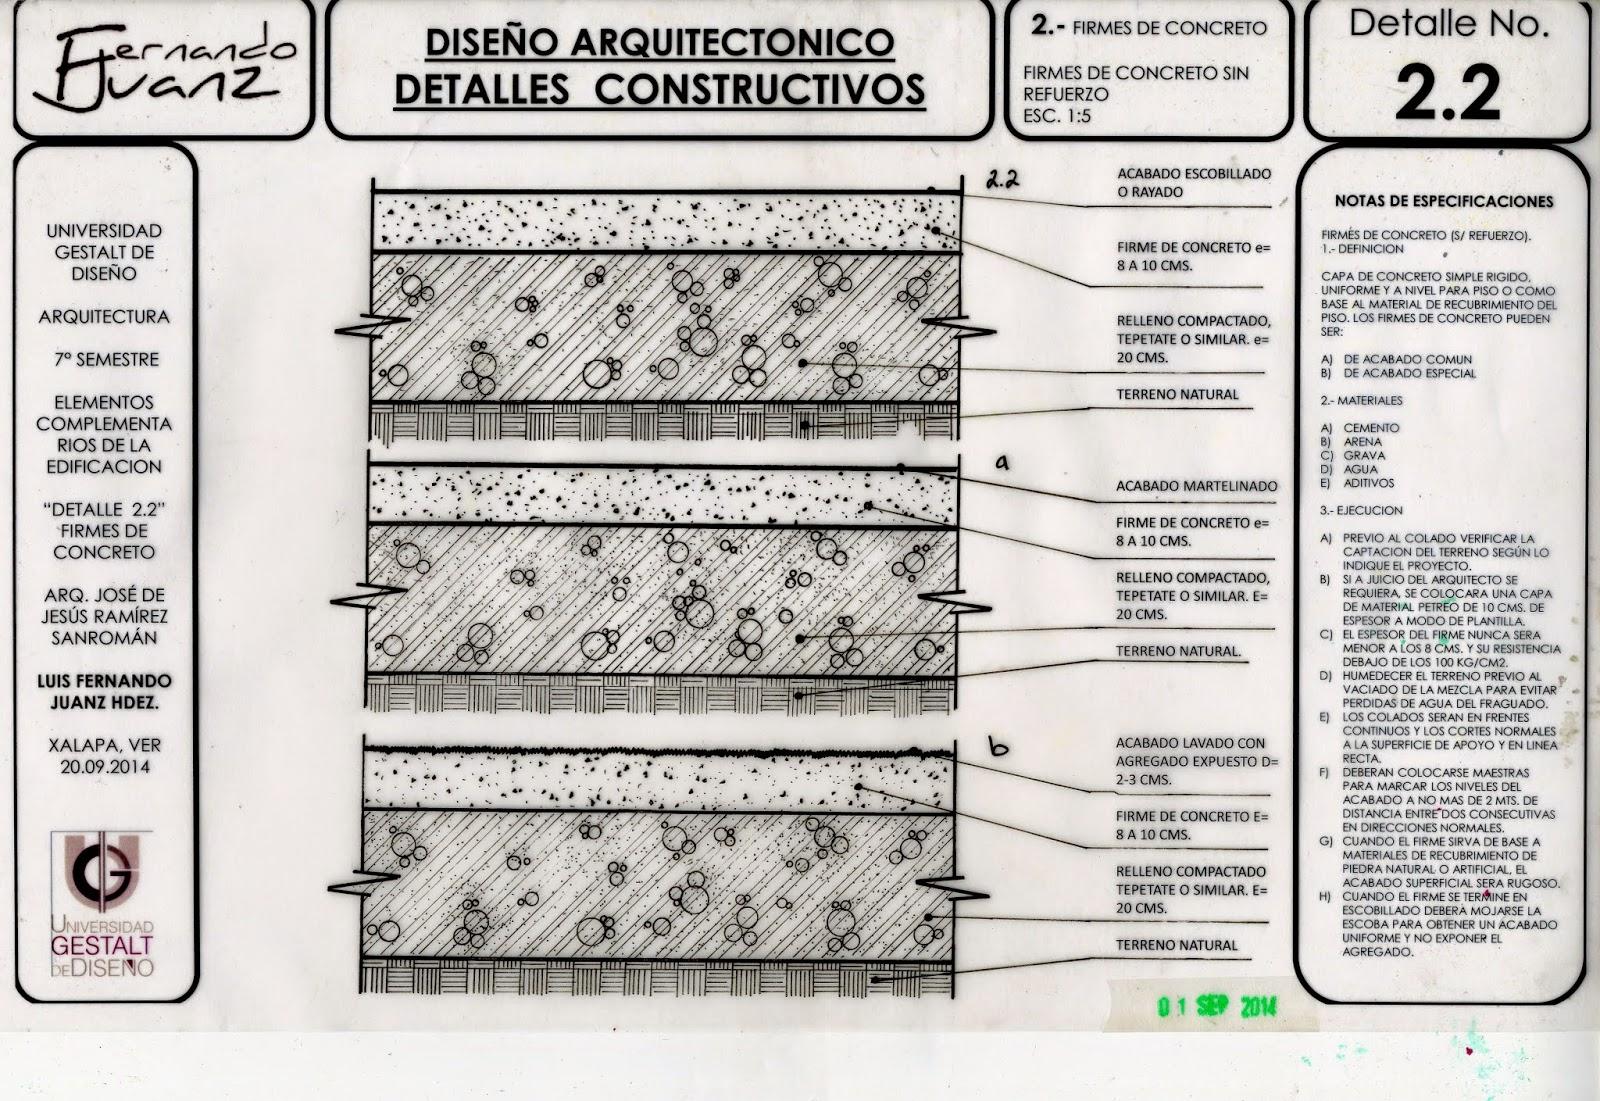 Elementos complementarios de la edificaci n detalle for Detalles constructivos de piscinas